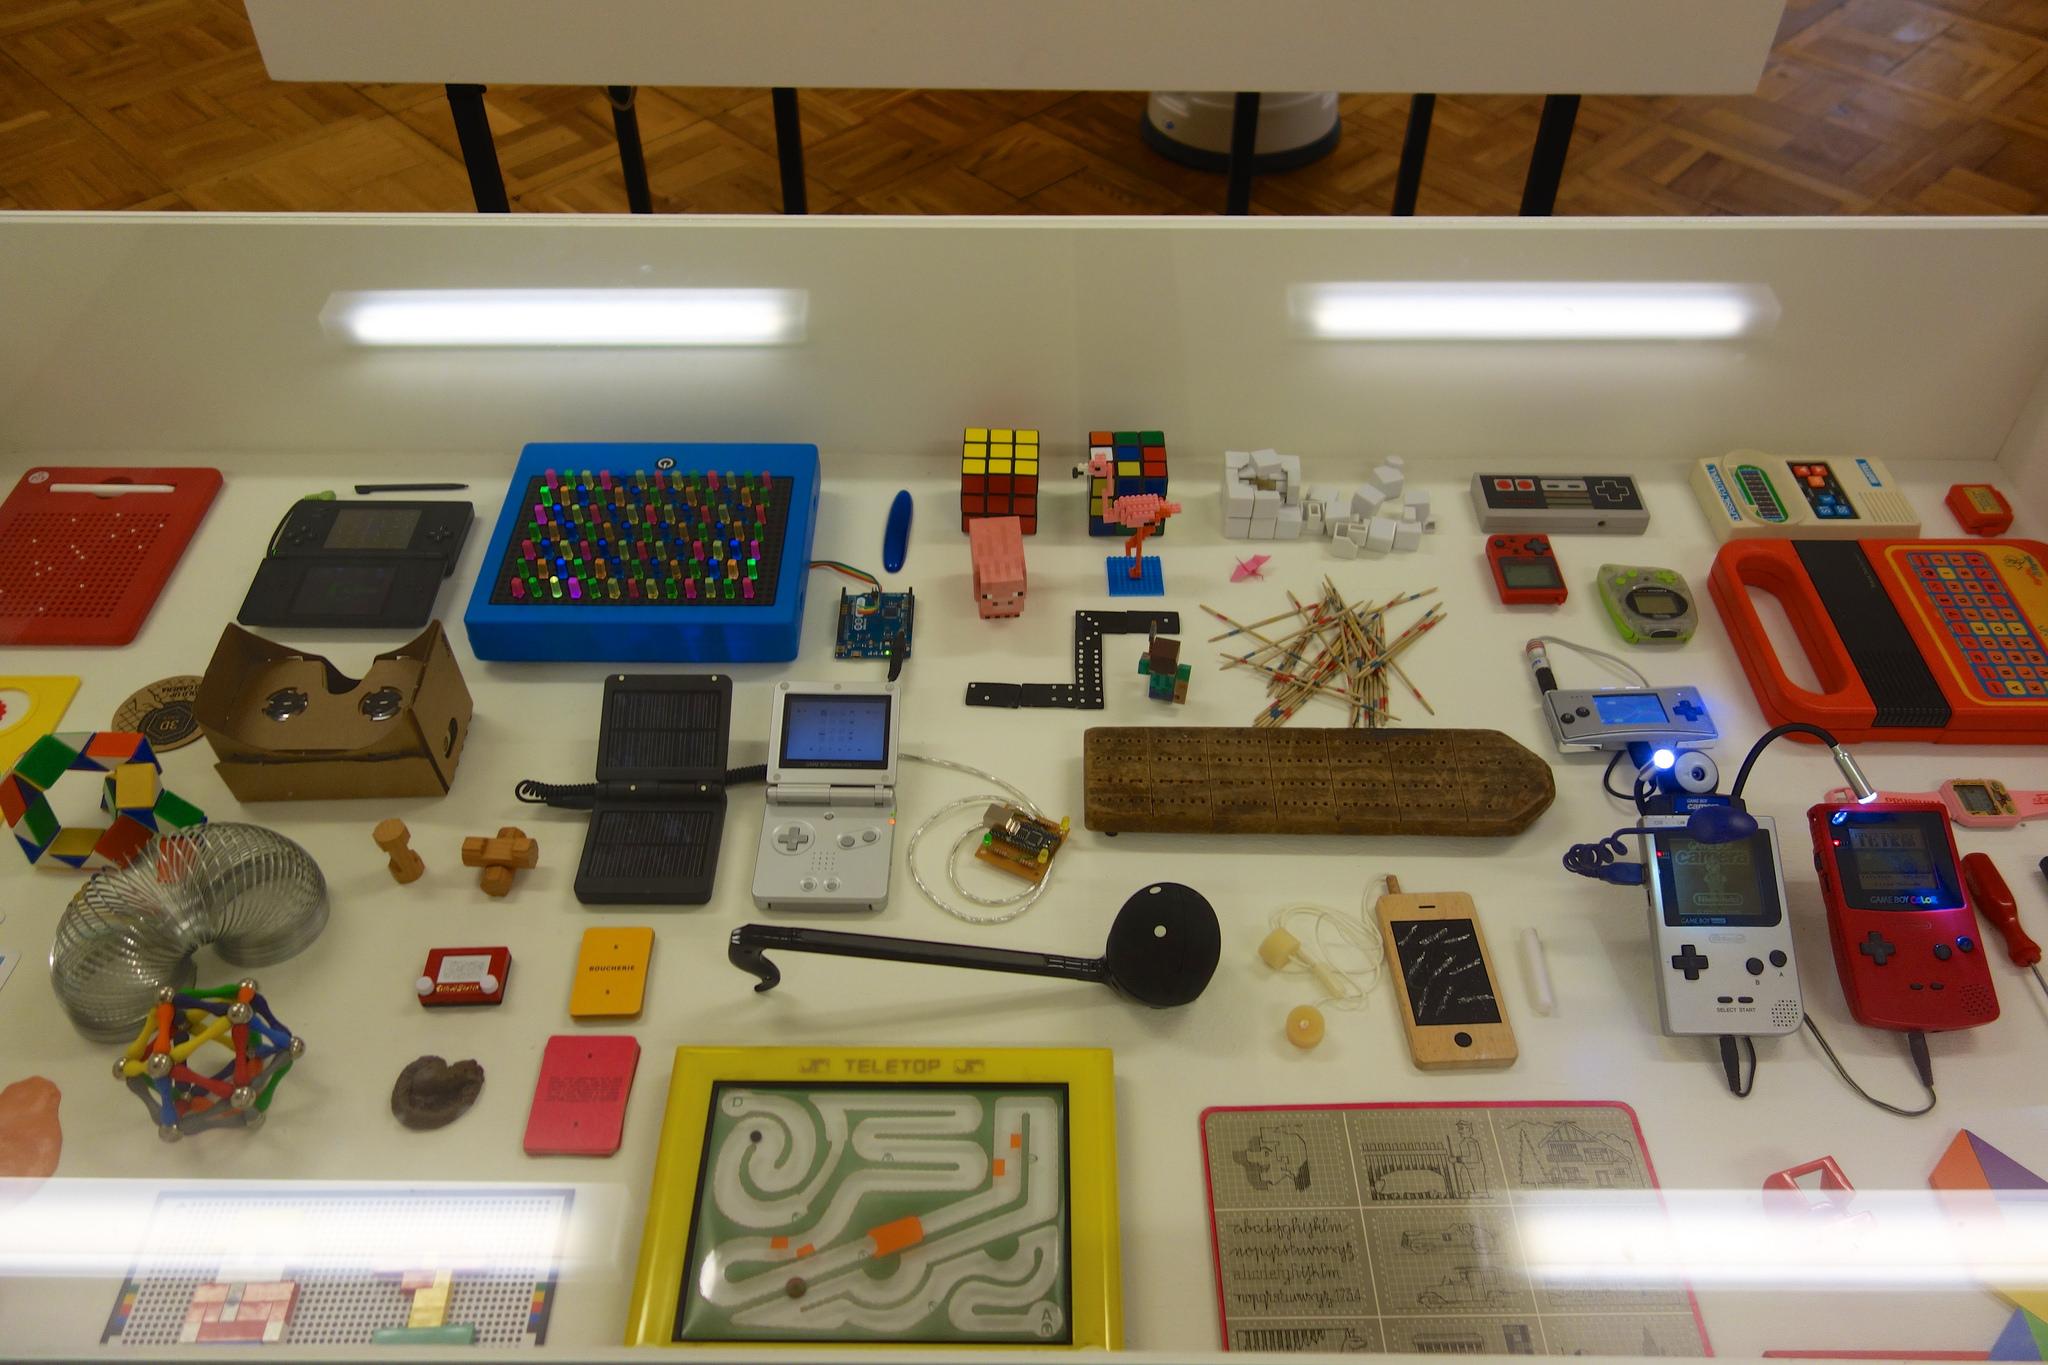 Retrocompatible Museum by Antonin Fourneau and Douglas-Edric Stanley